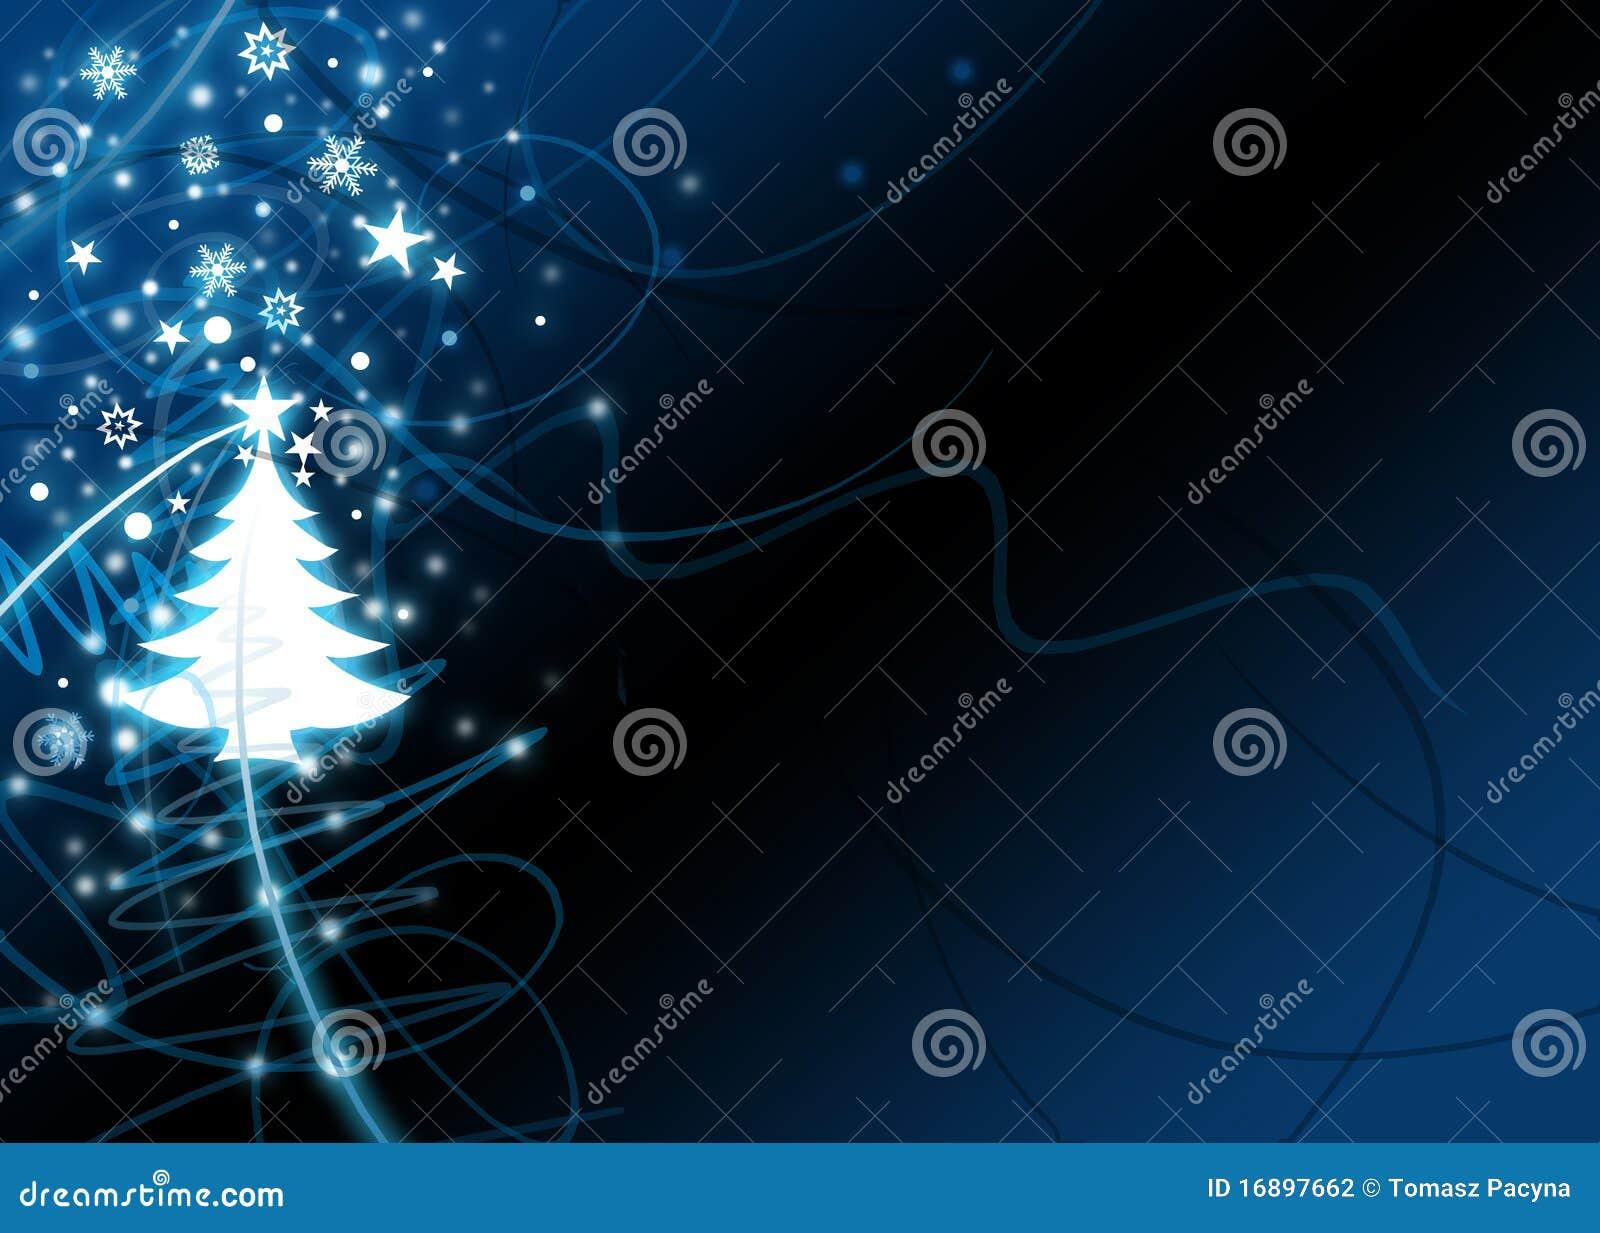 Xmas Tree Background